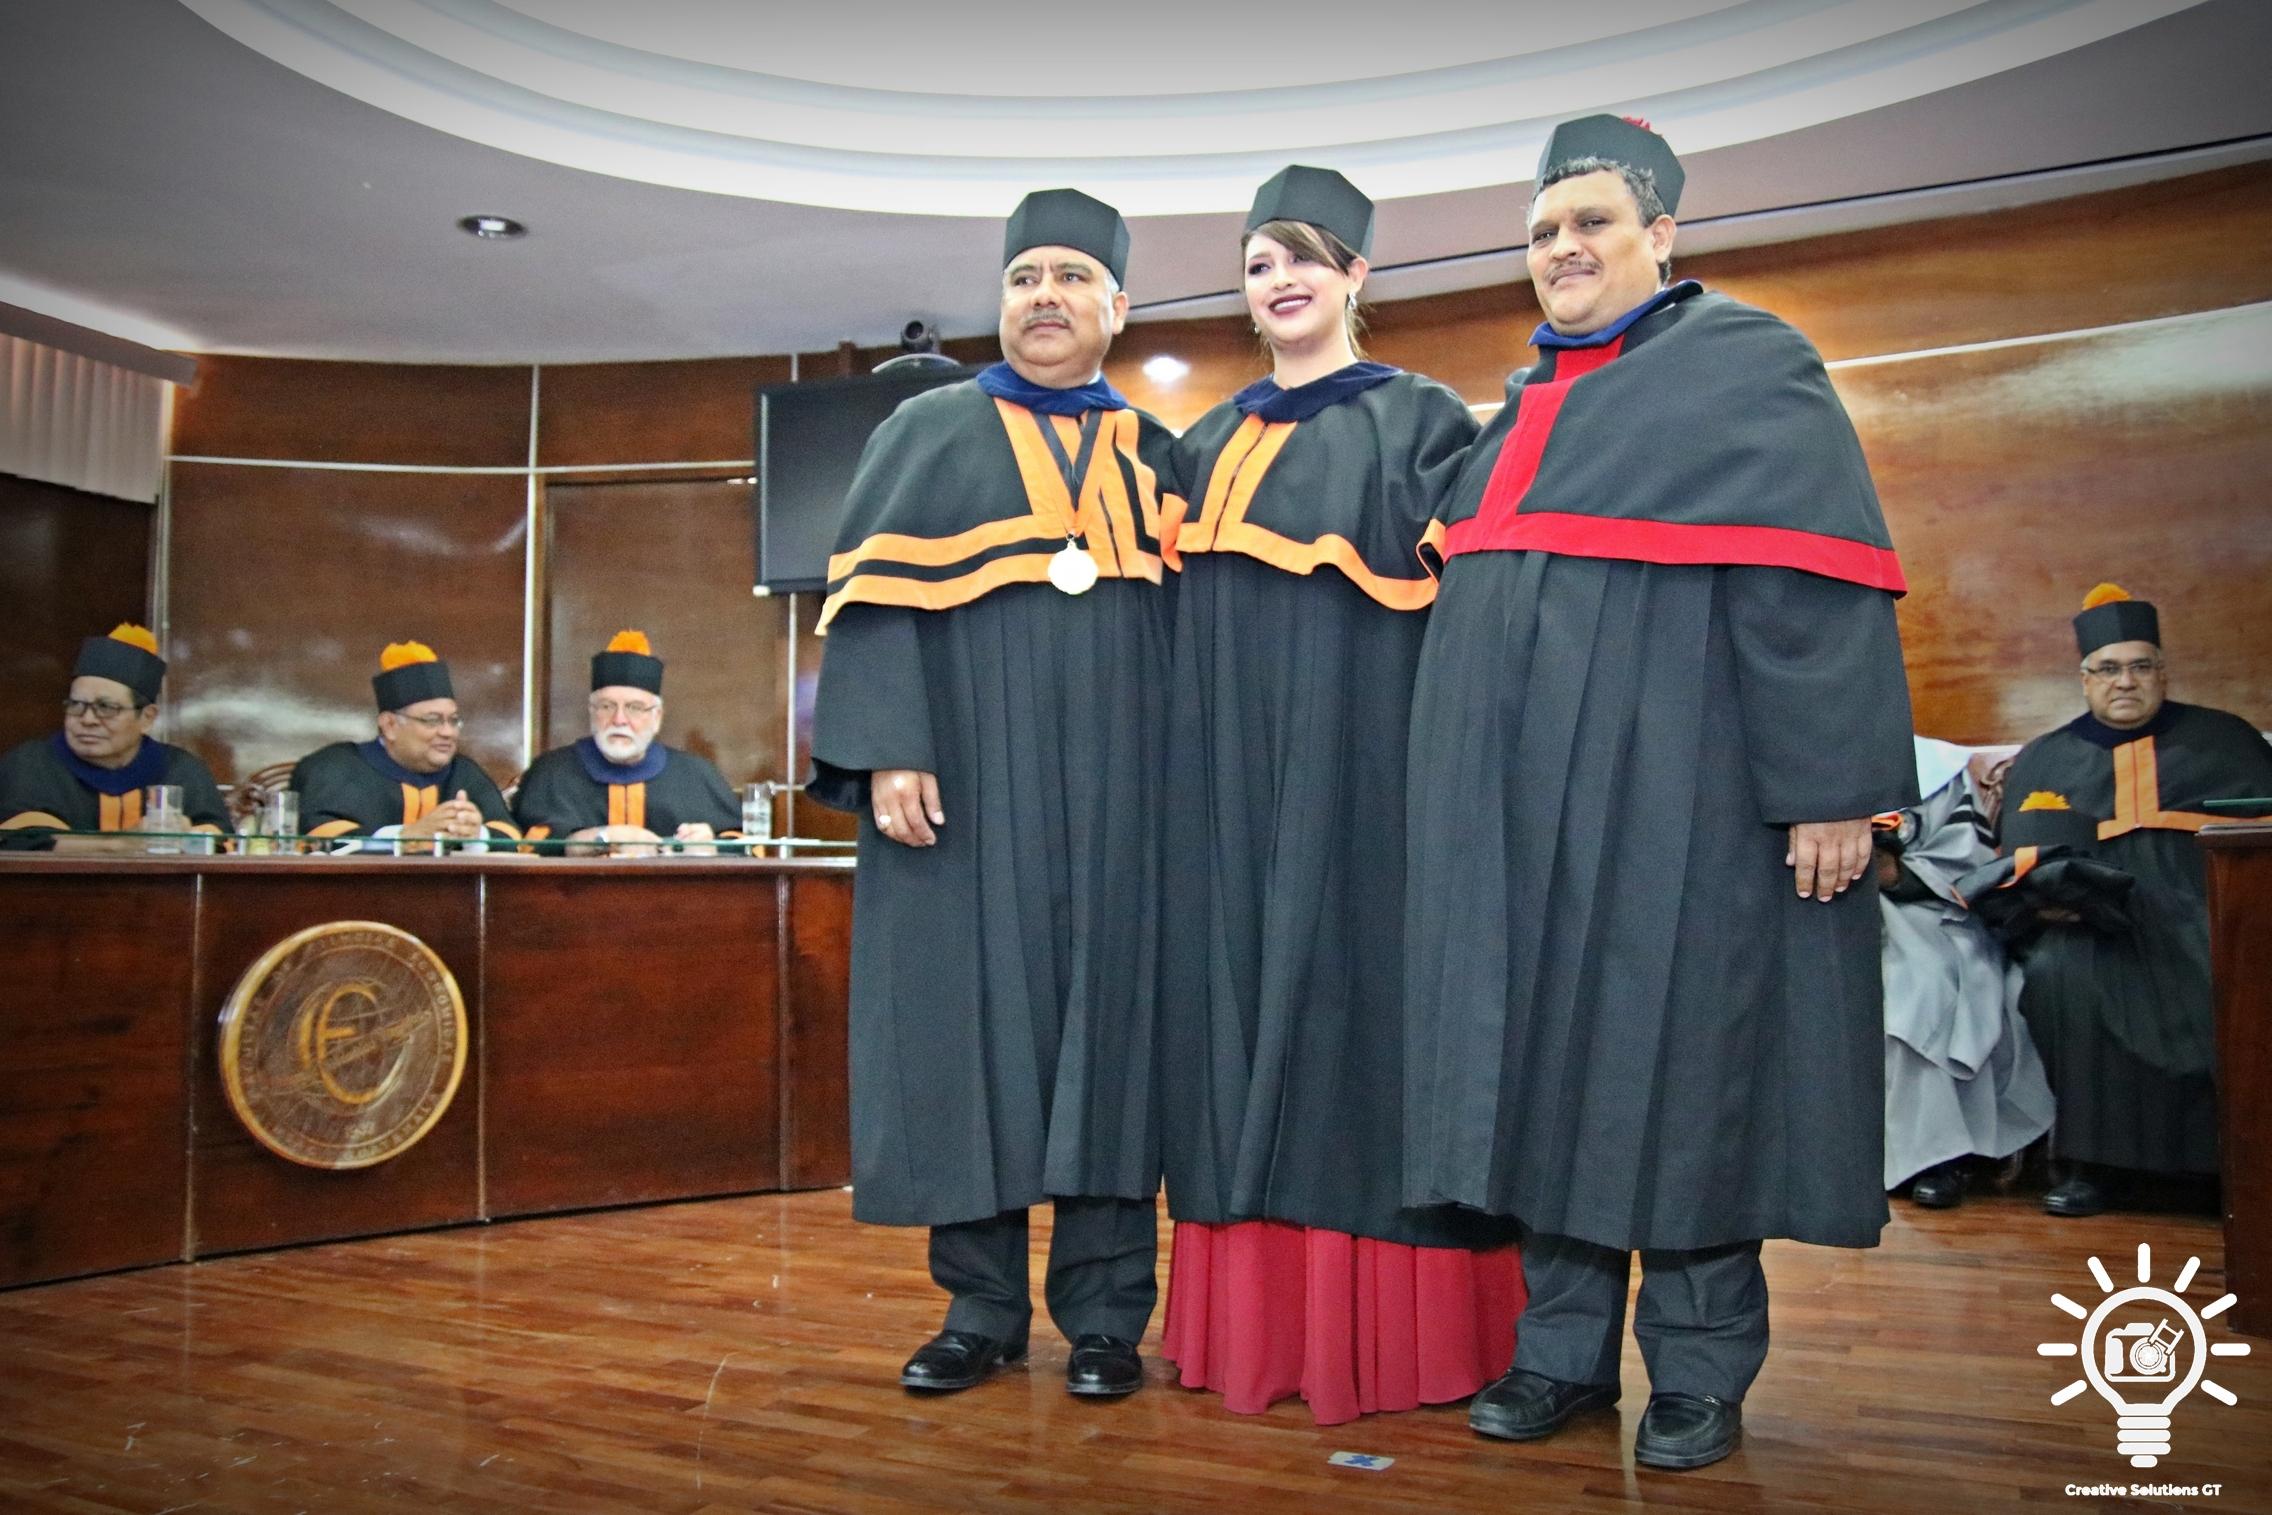 fotografia para graduaciones en guatemala (2)